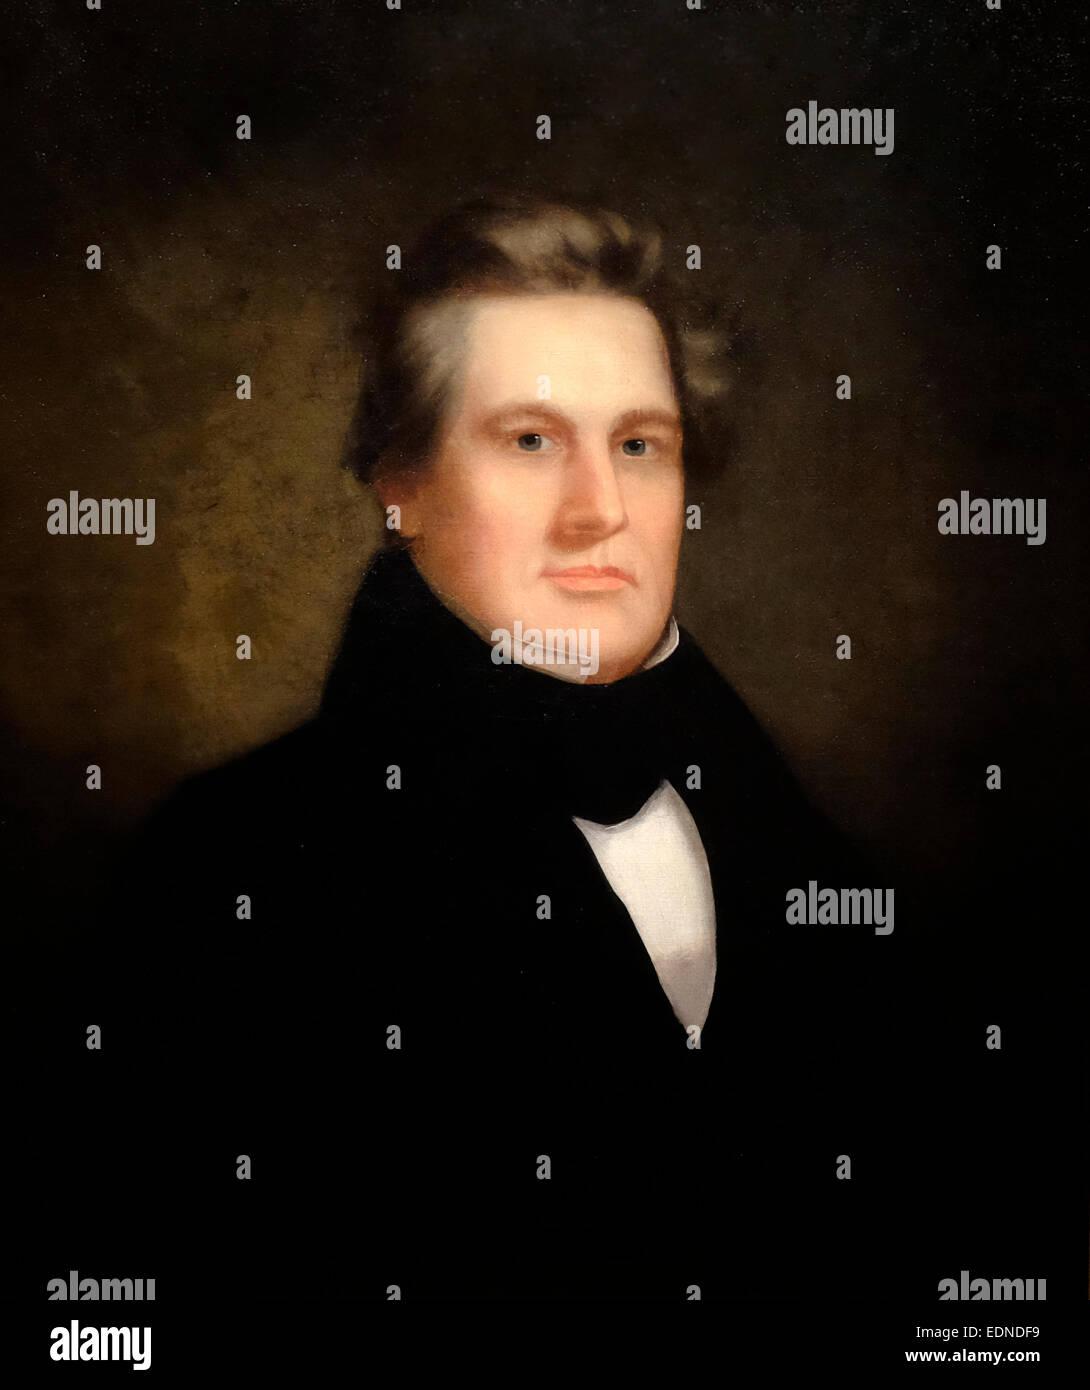 President Millard Fillmore - Unidentified artist, circa 1843 - Stock Image